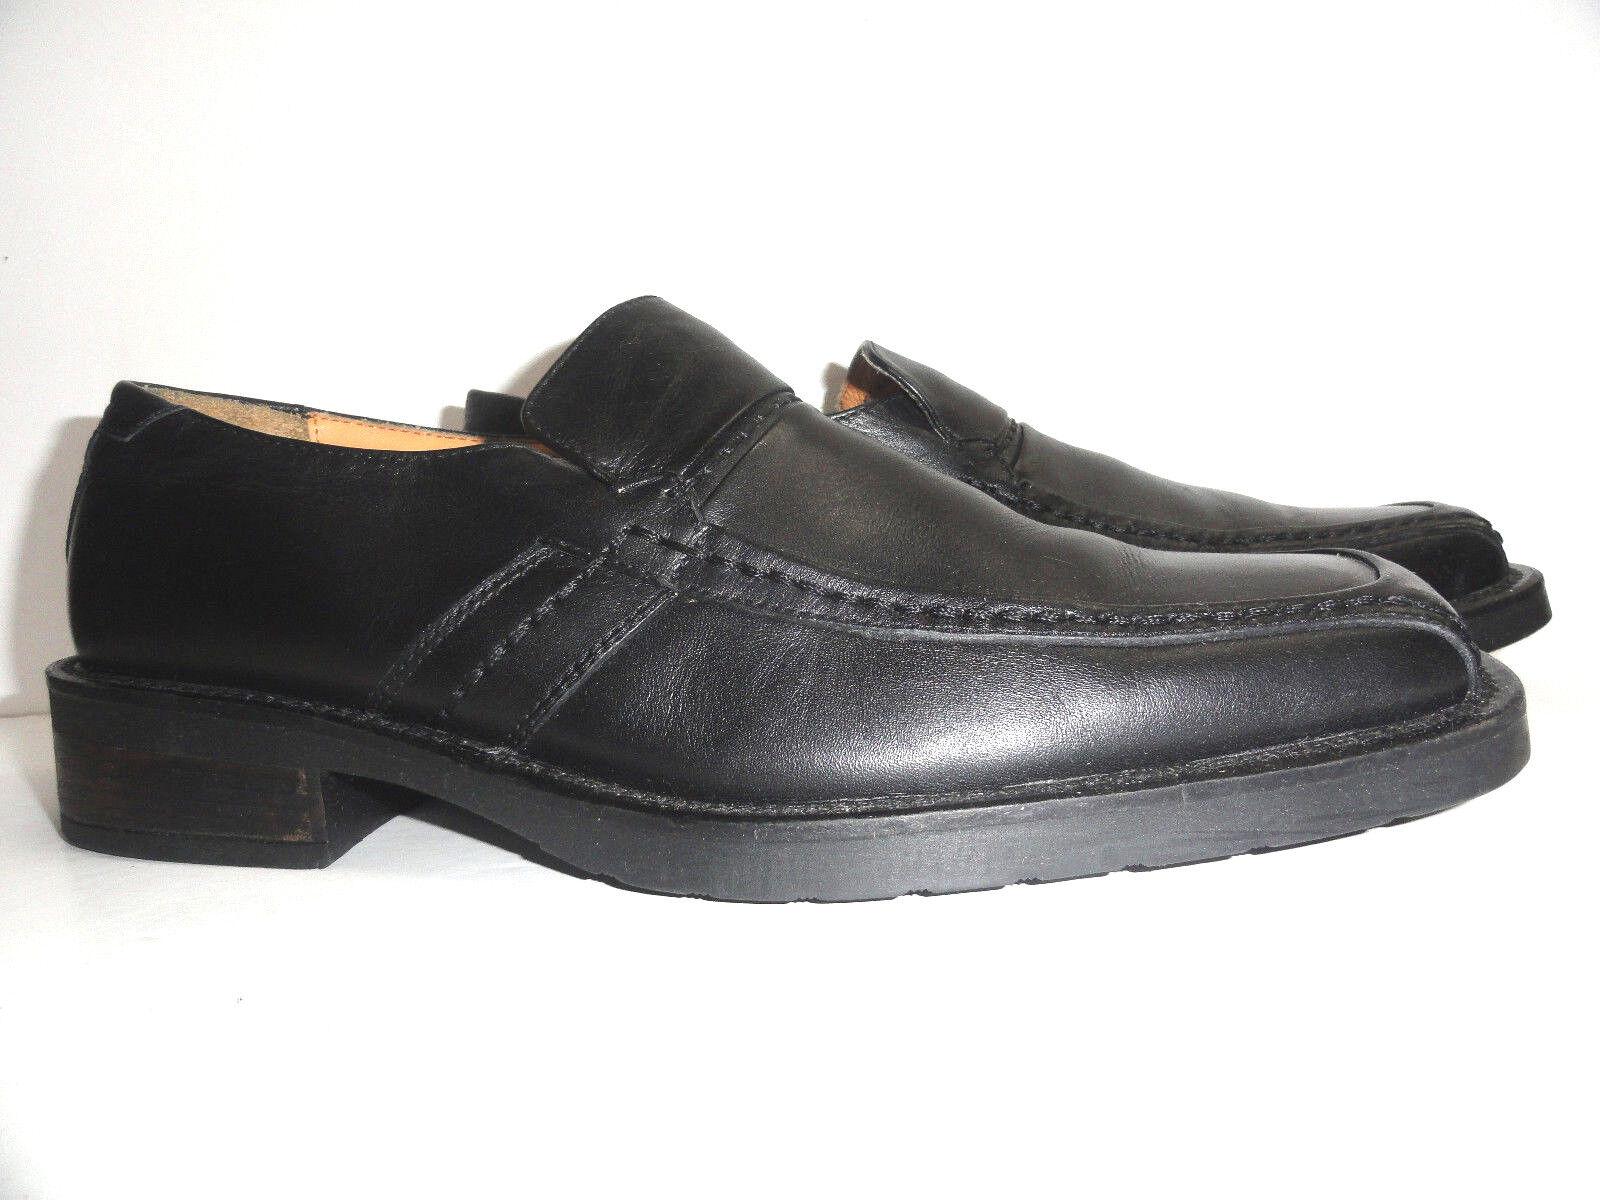 Johnston & Murphy Men's Slip-On Black Leather Loafers shoes Size 8